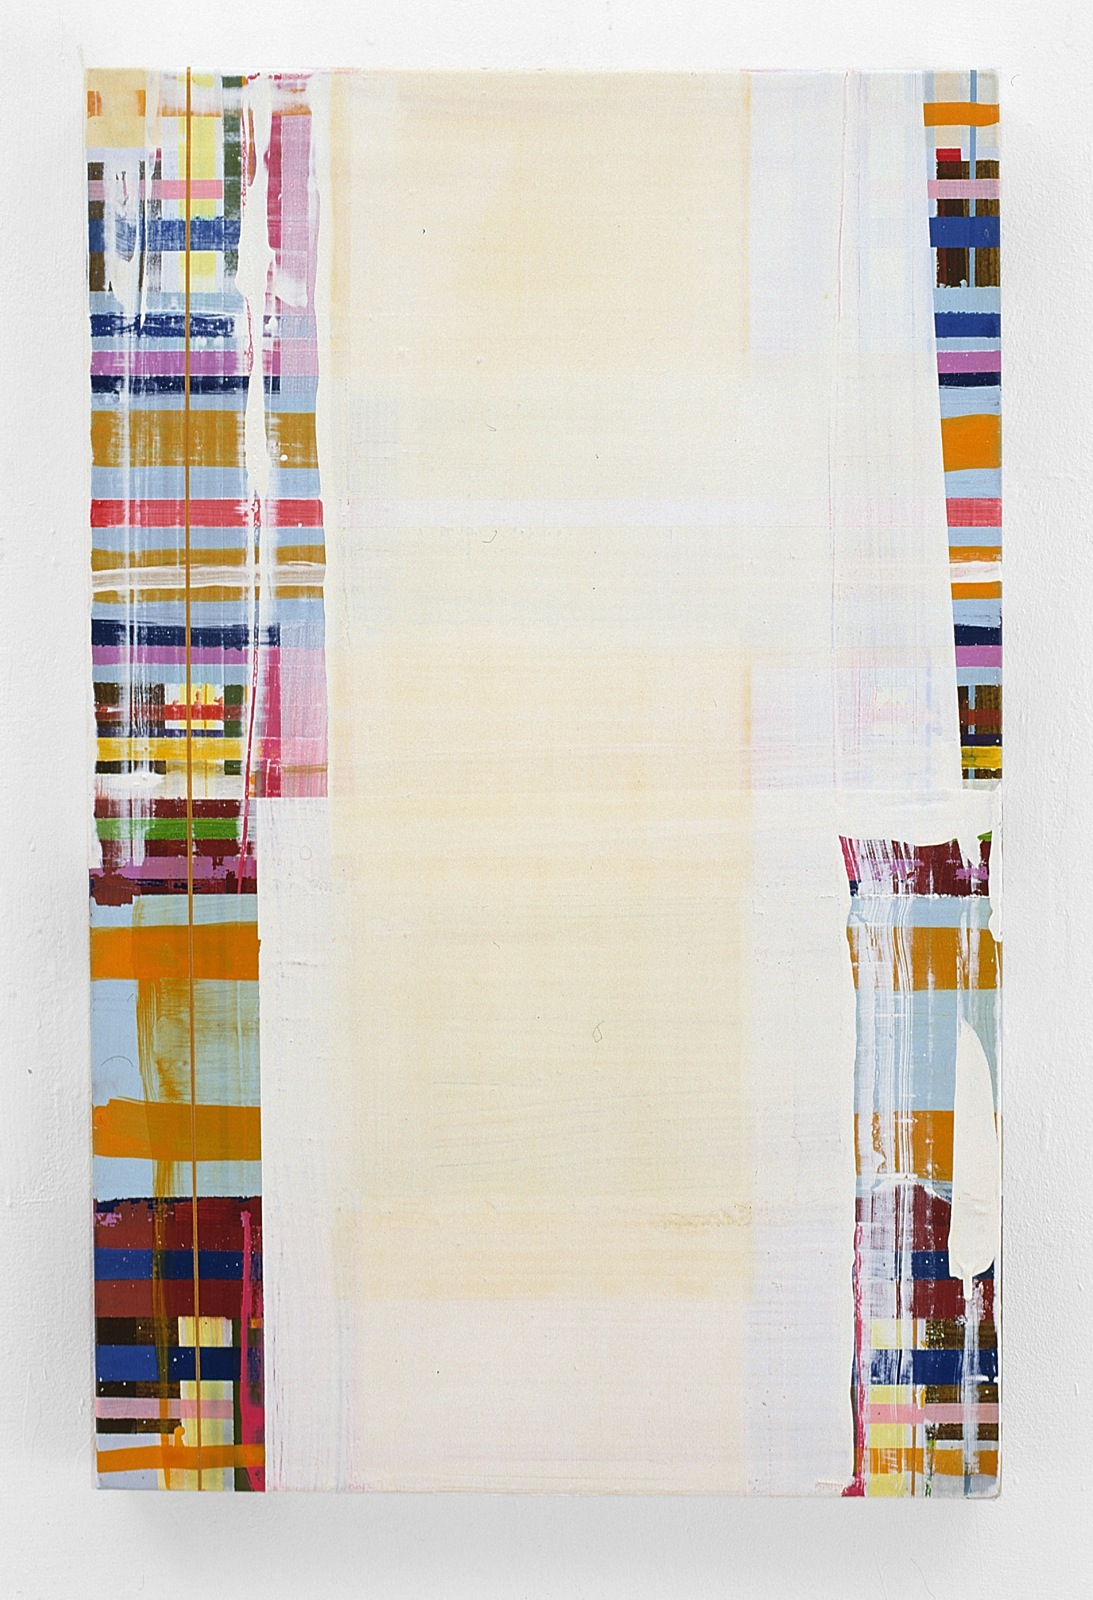 """Menton"", 70x80 cm, Acrylfarbe, Leinwand, 2001"